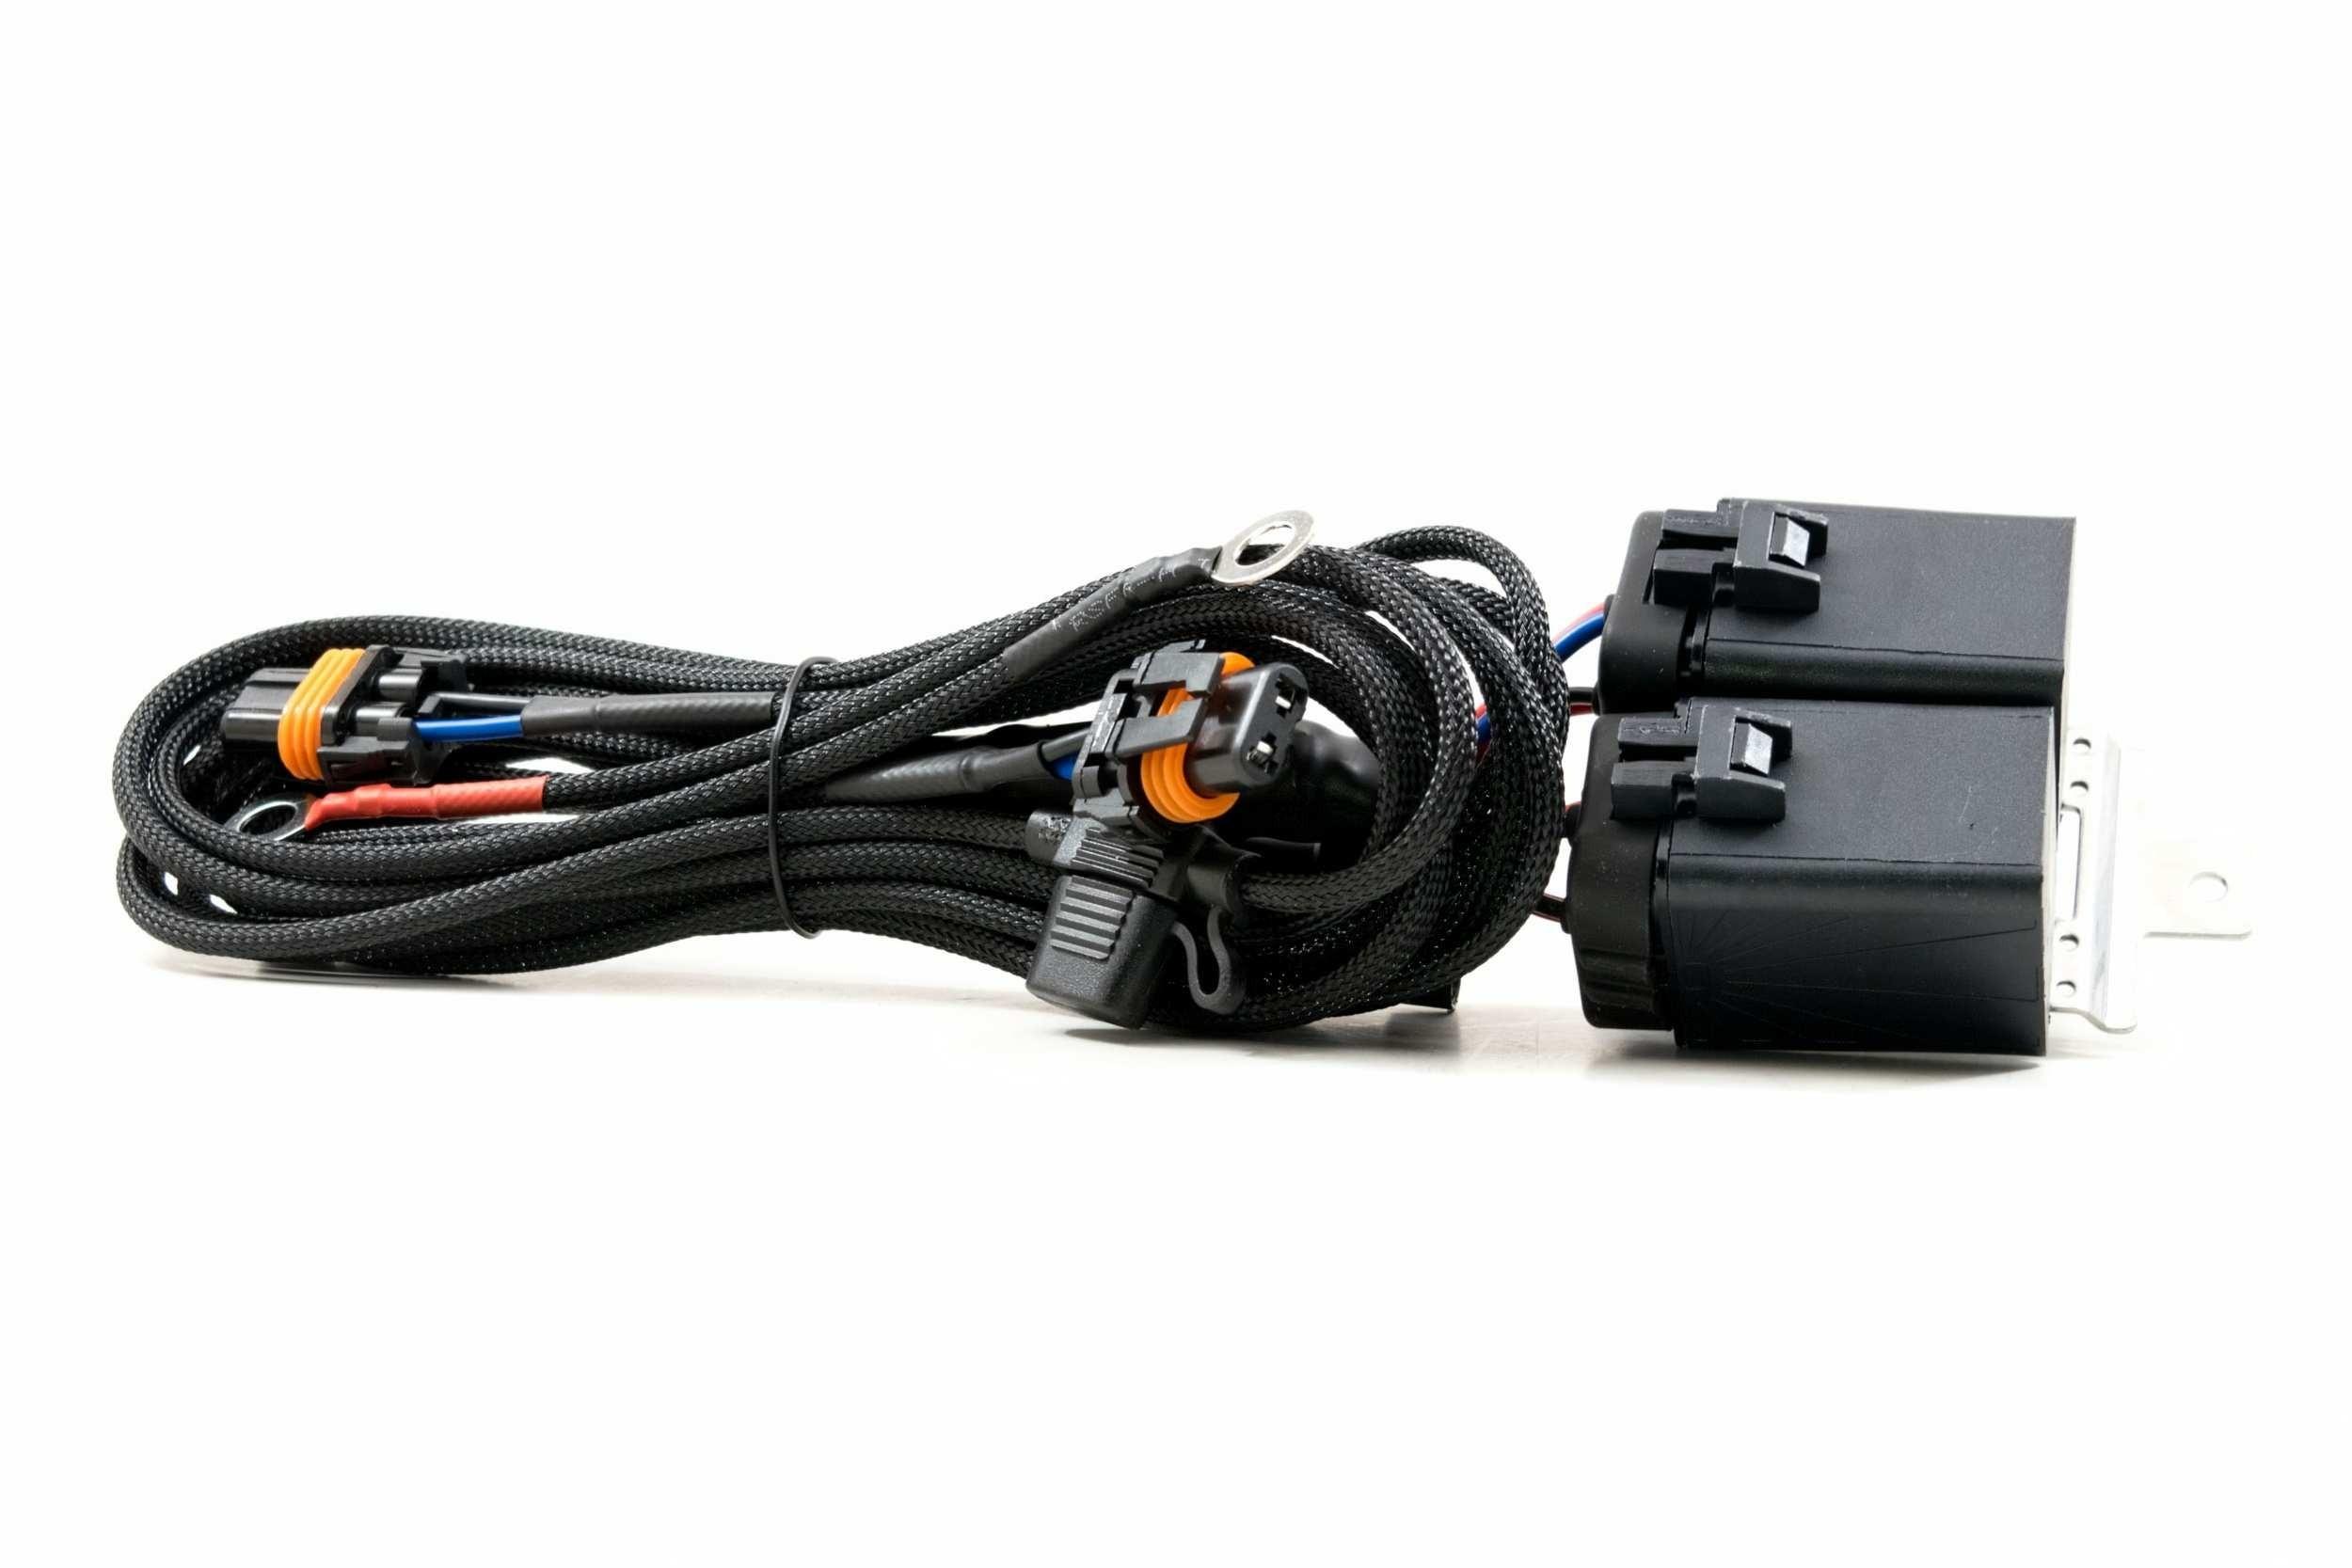 morimoto_9005_9006_h3b_hb4_headlight_relay_wire_harness_1_2